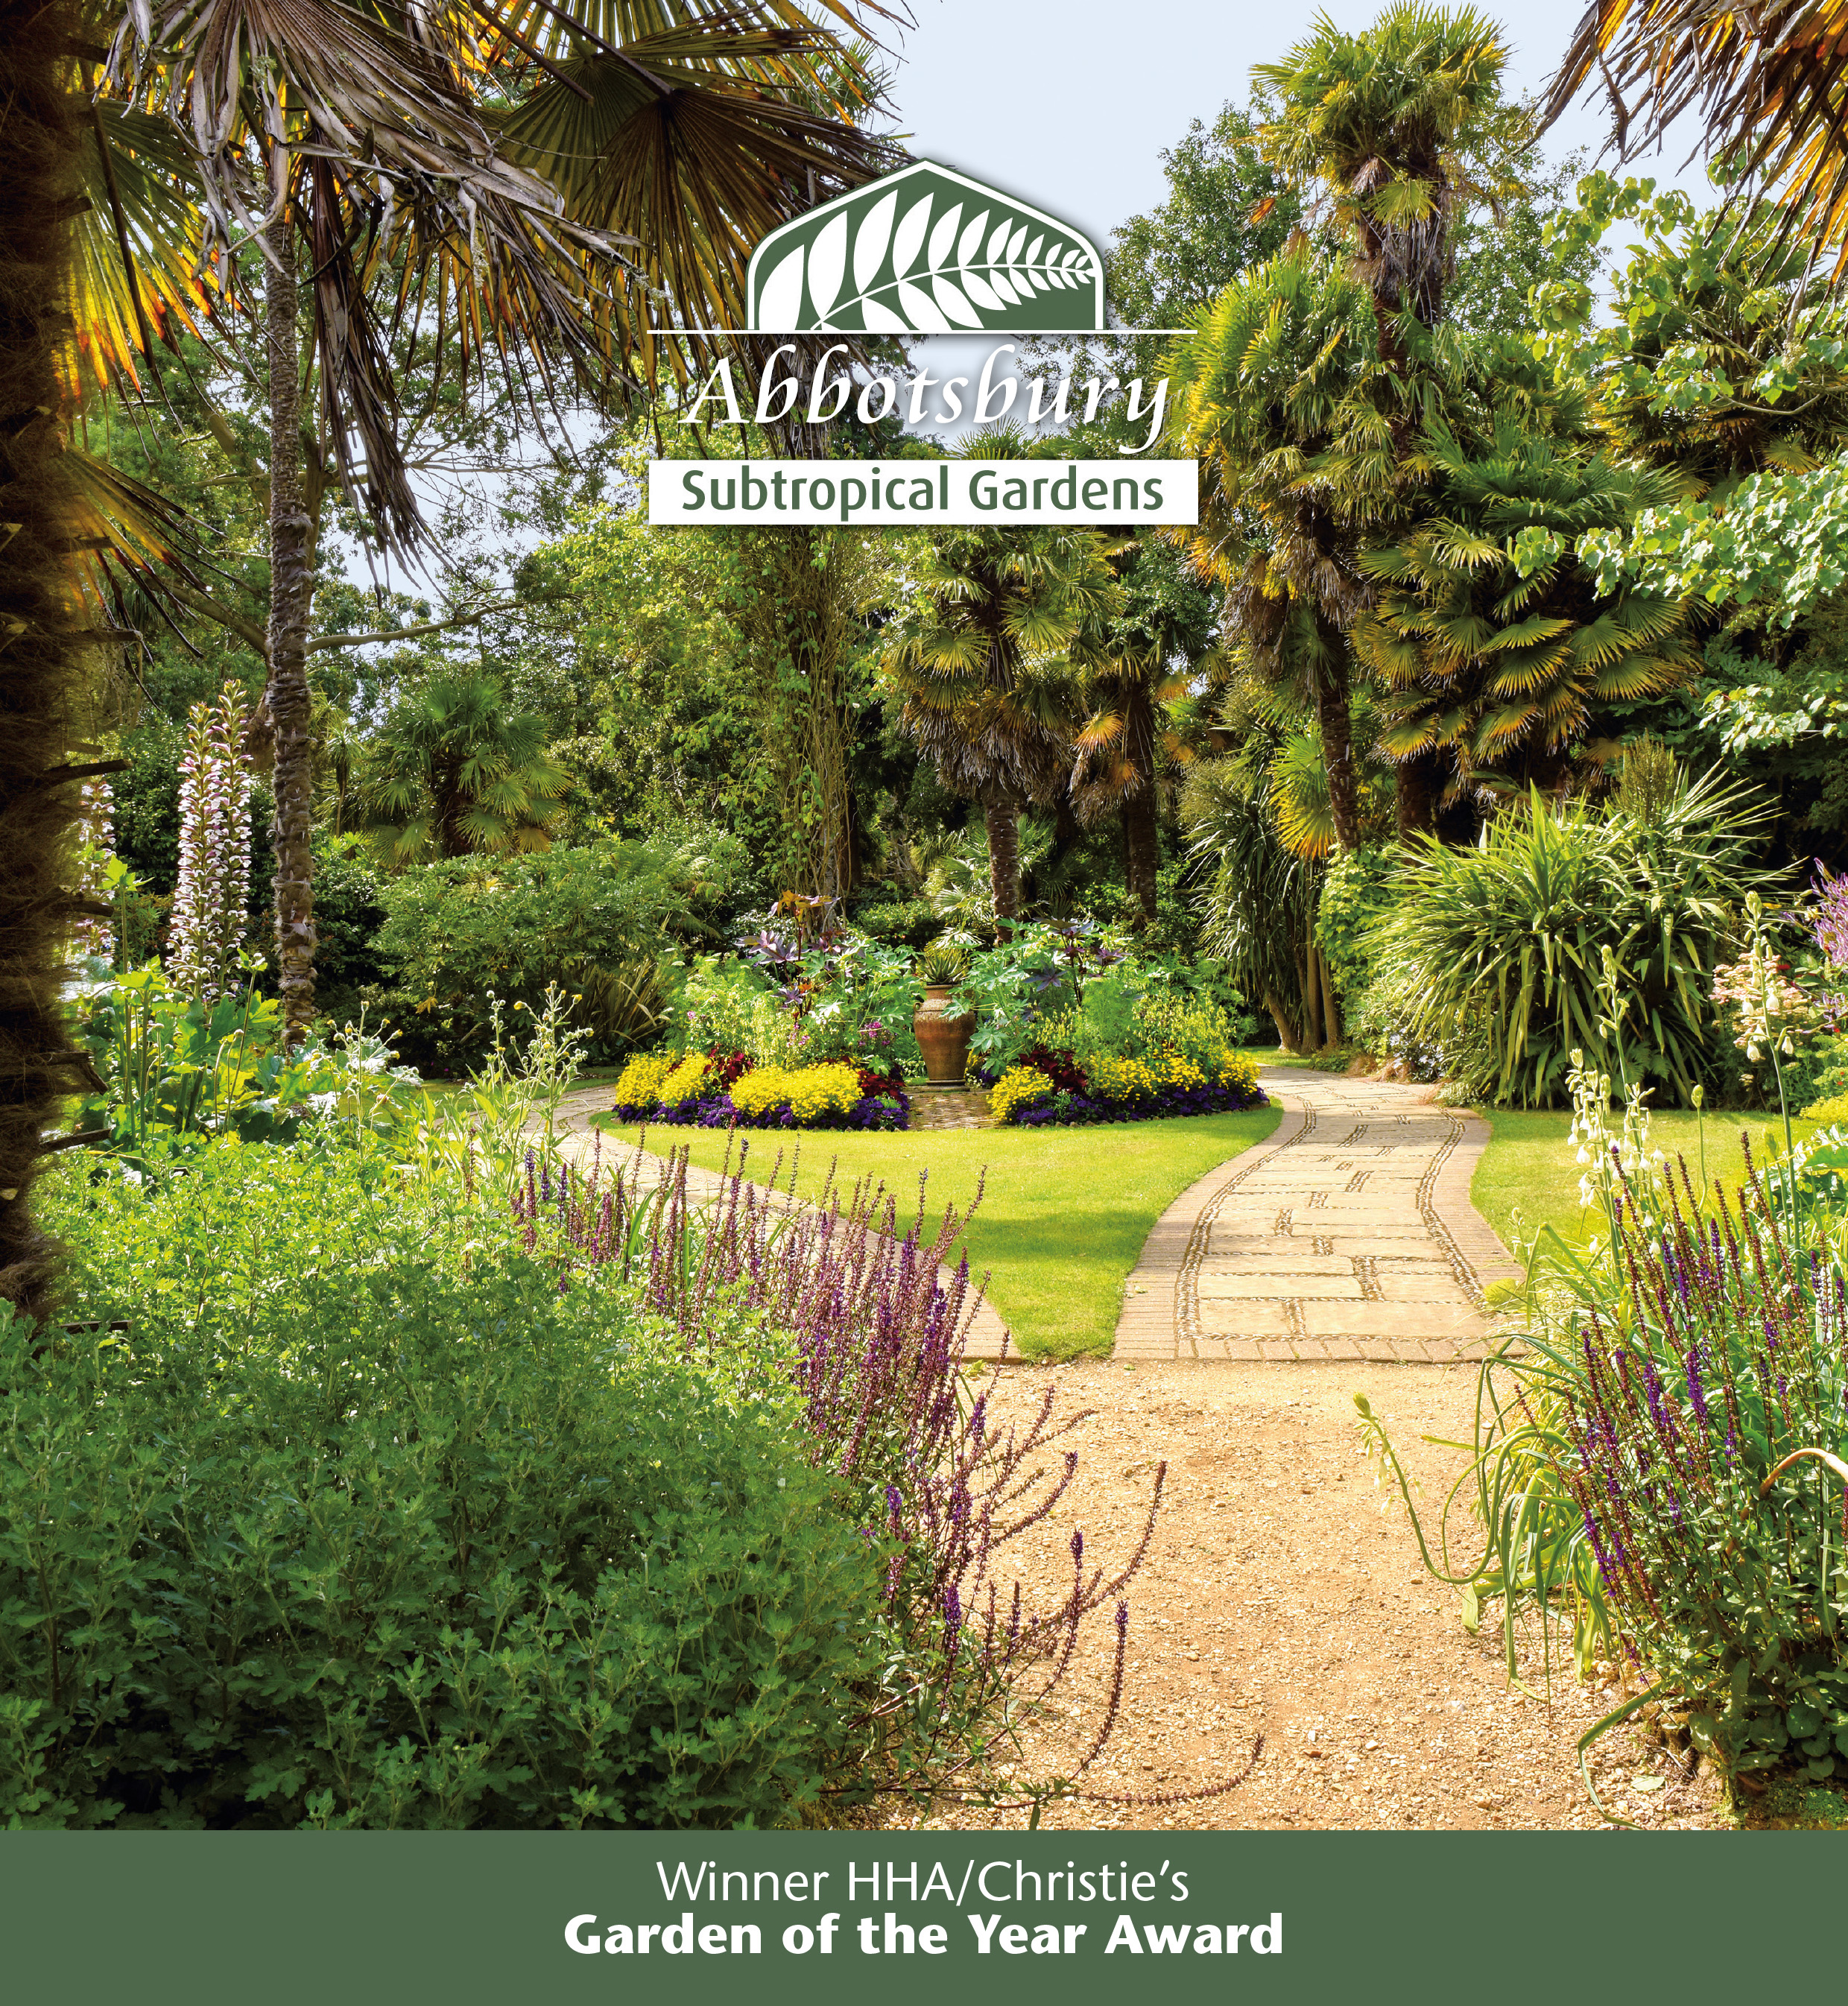 Abbotsbury Subtropical Gardens